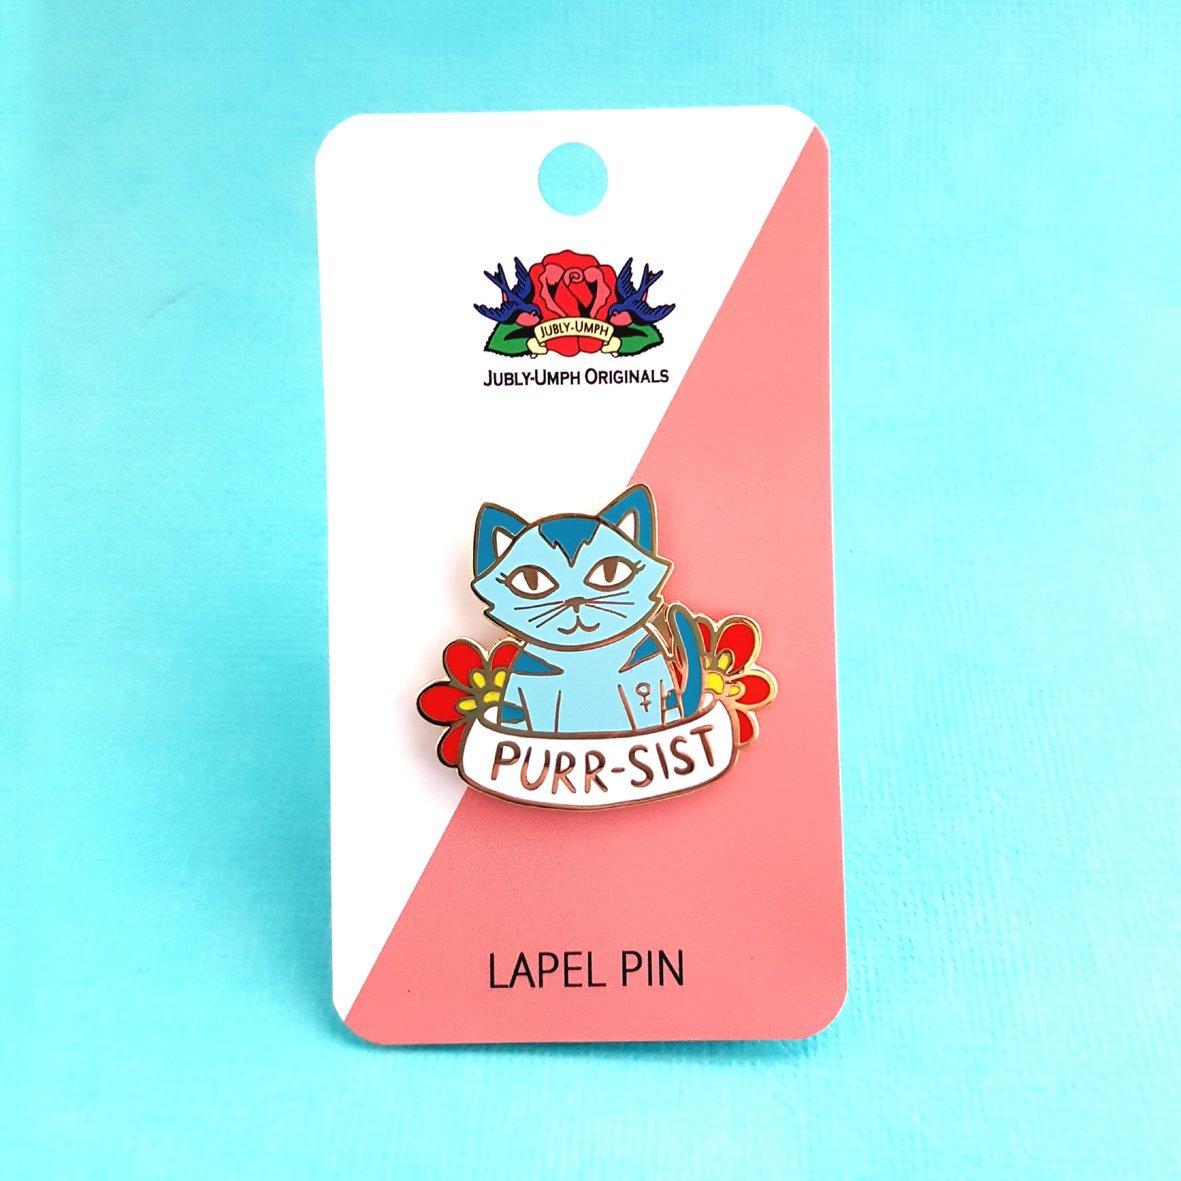 Jubly-Umph Purr-sistence Kitty Lapel Pin image